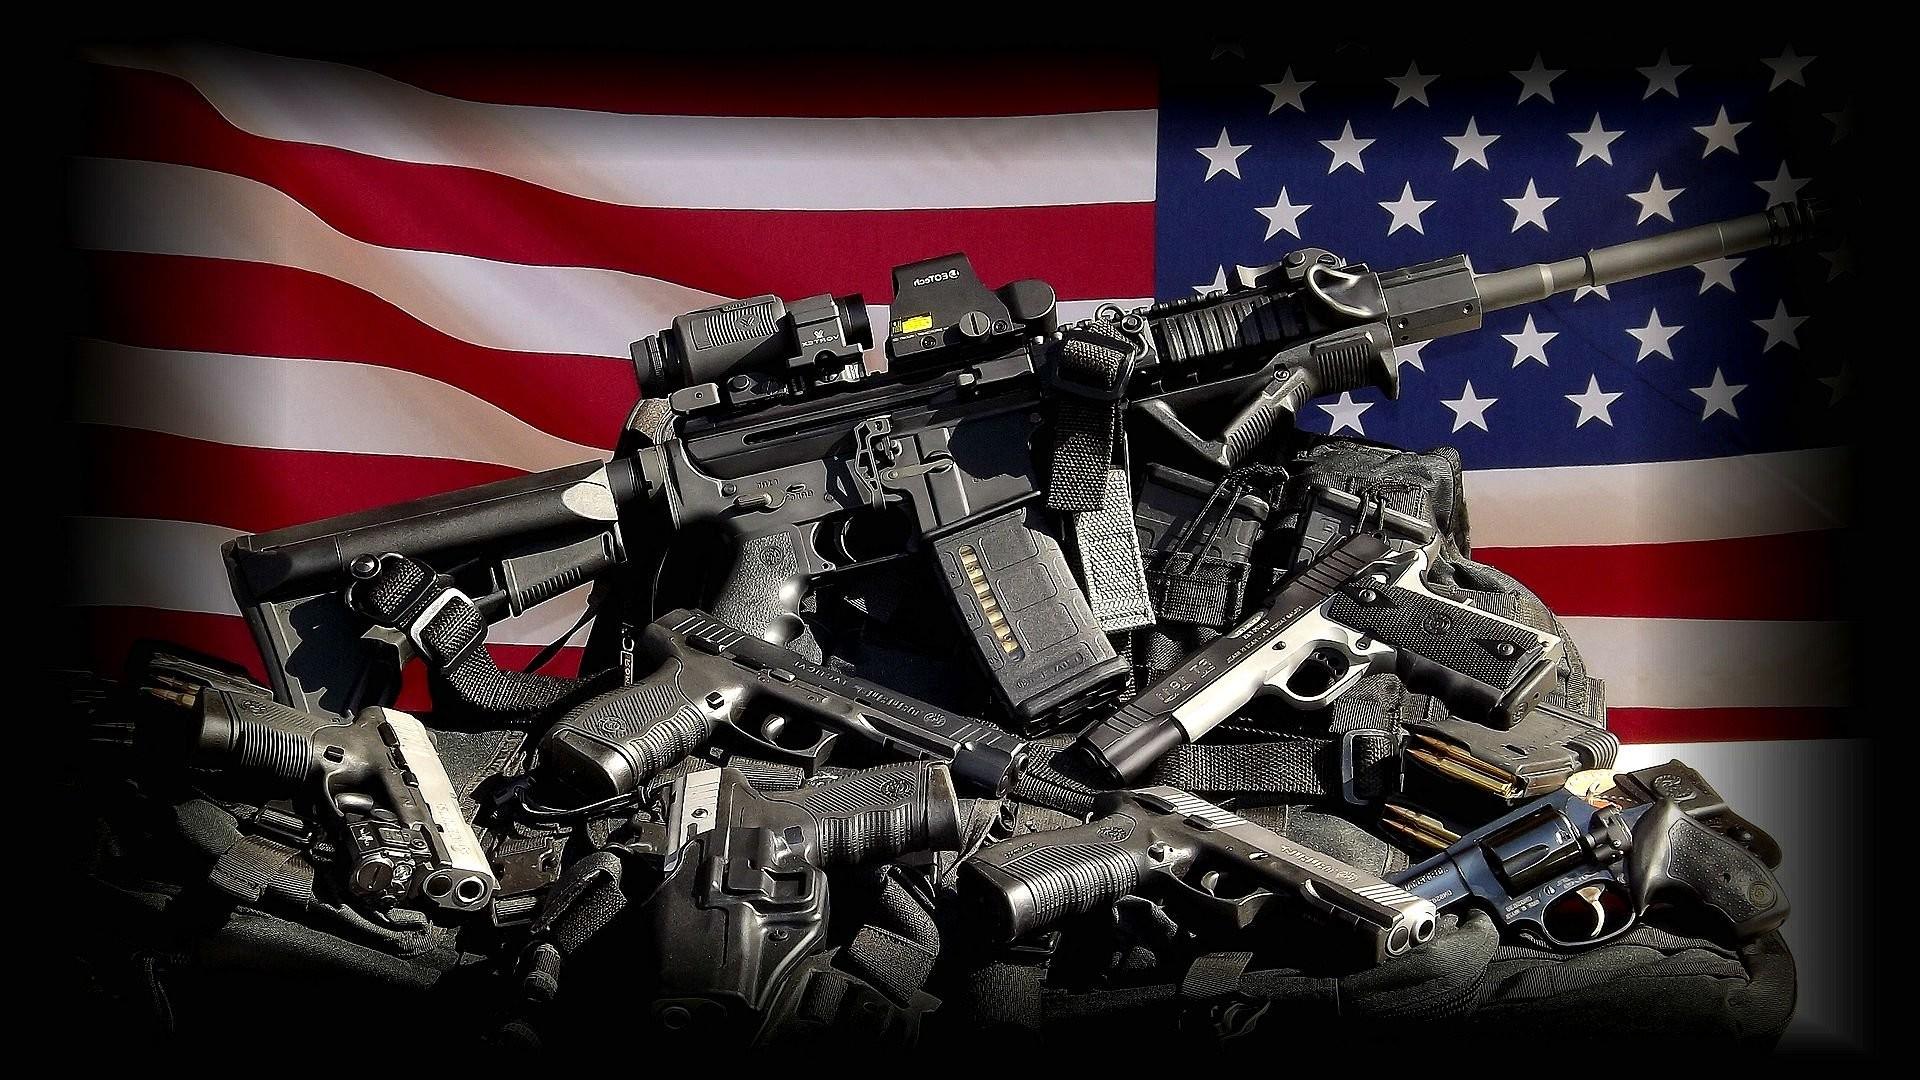 GUN CONTROL weapon politics anarchy protest political weapons guns usa  milityary flag wallpaper     487260   WallpaperUP